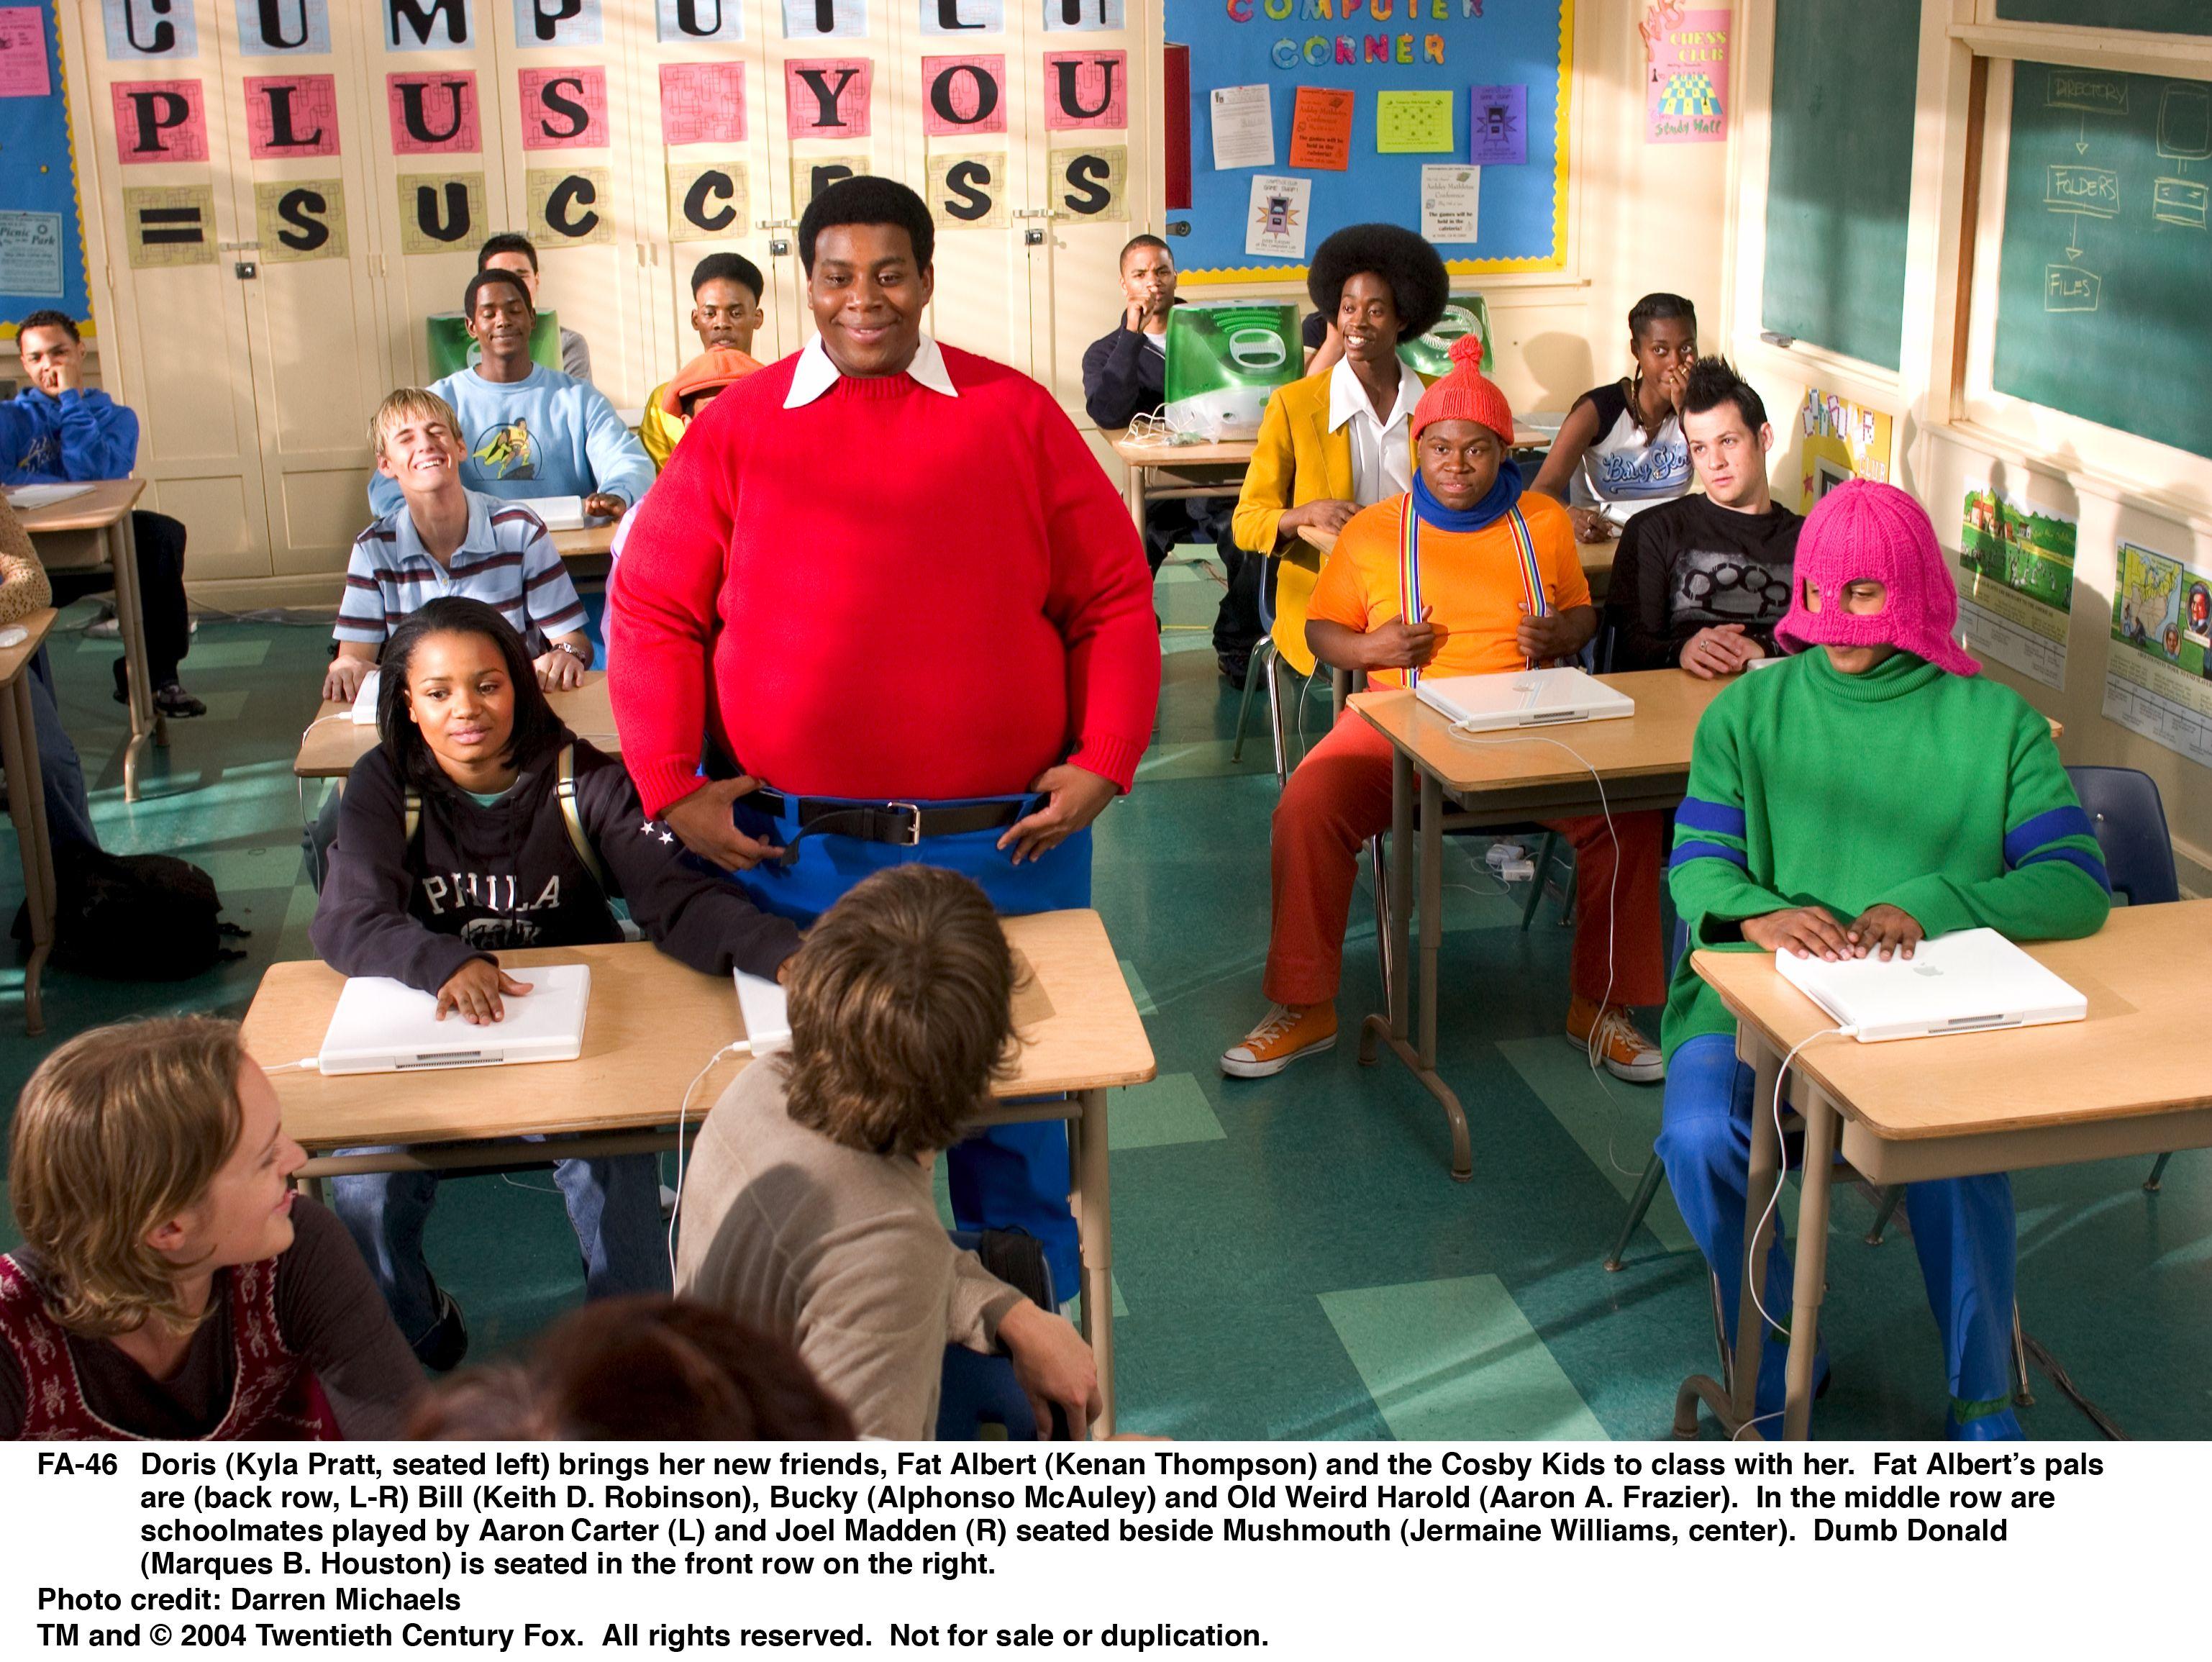 Aaron Carter, Aaron Frazier, Kyla Pratt, Keith Robinson, Kenan Thompson, Jermaine Williams, Joel Madden, and Alphonso McAuley in Fat Albert (2004)